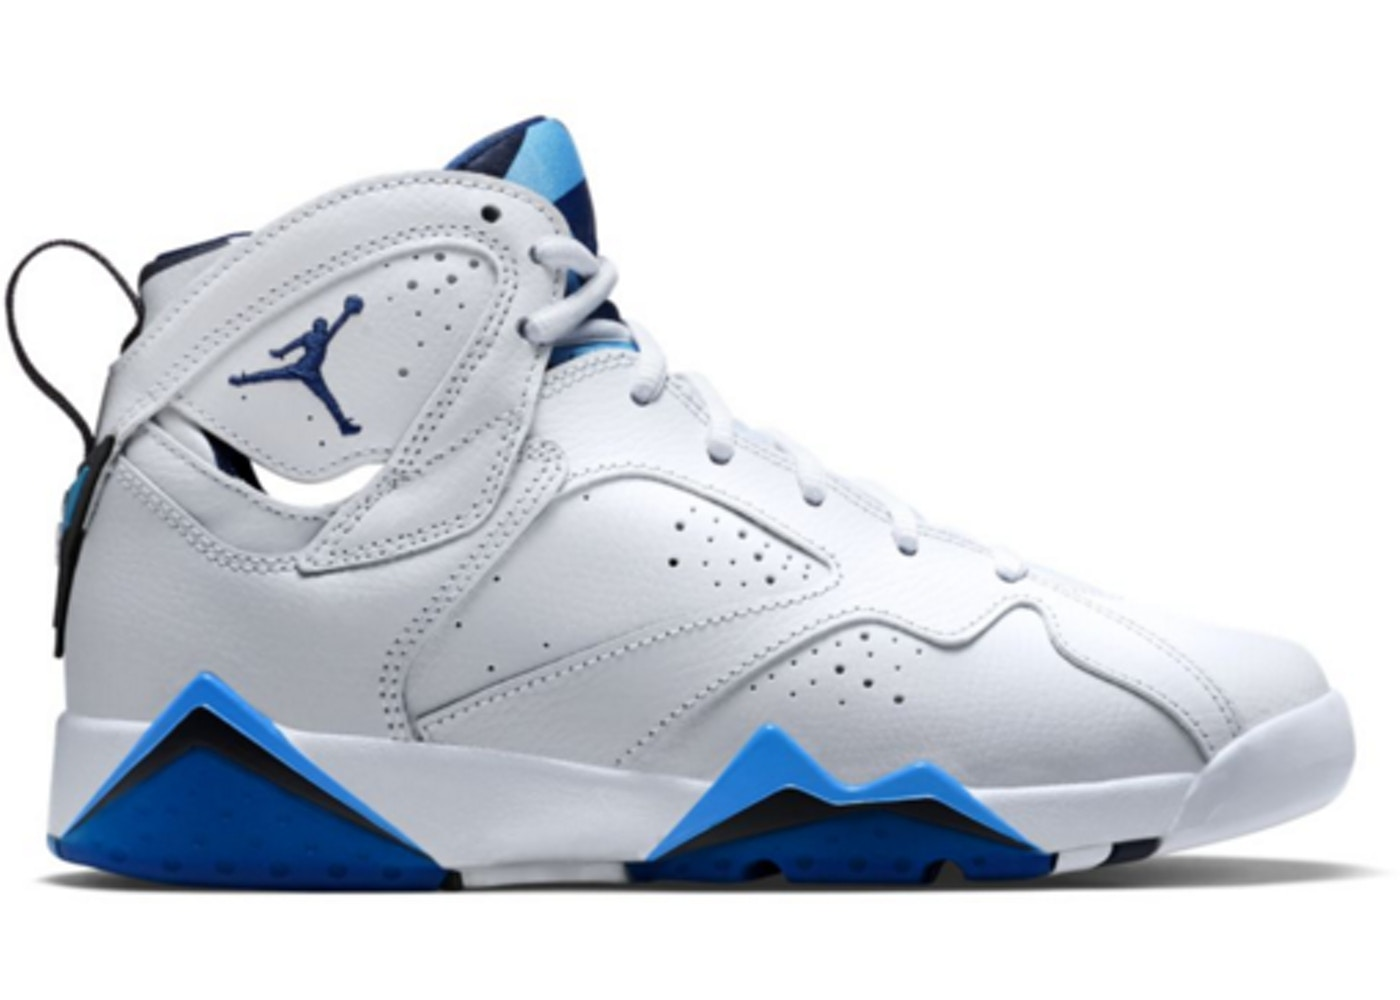 outlet store 67e95 dcc50 Buy Air Jordan 7 Shoes   Deadstock Sneakers